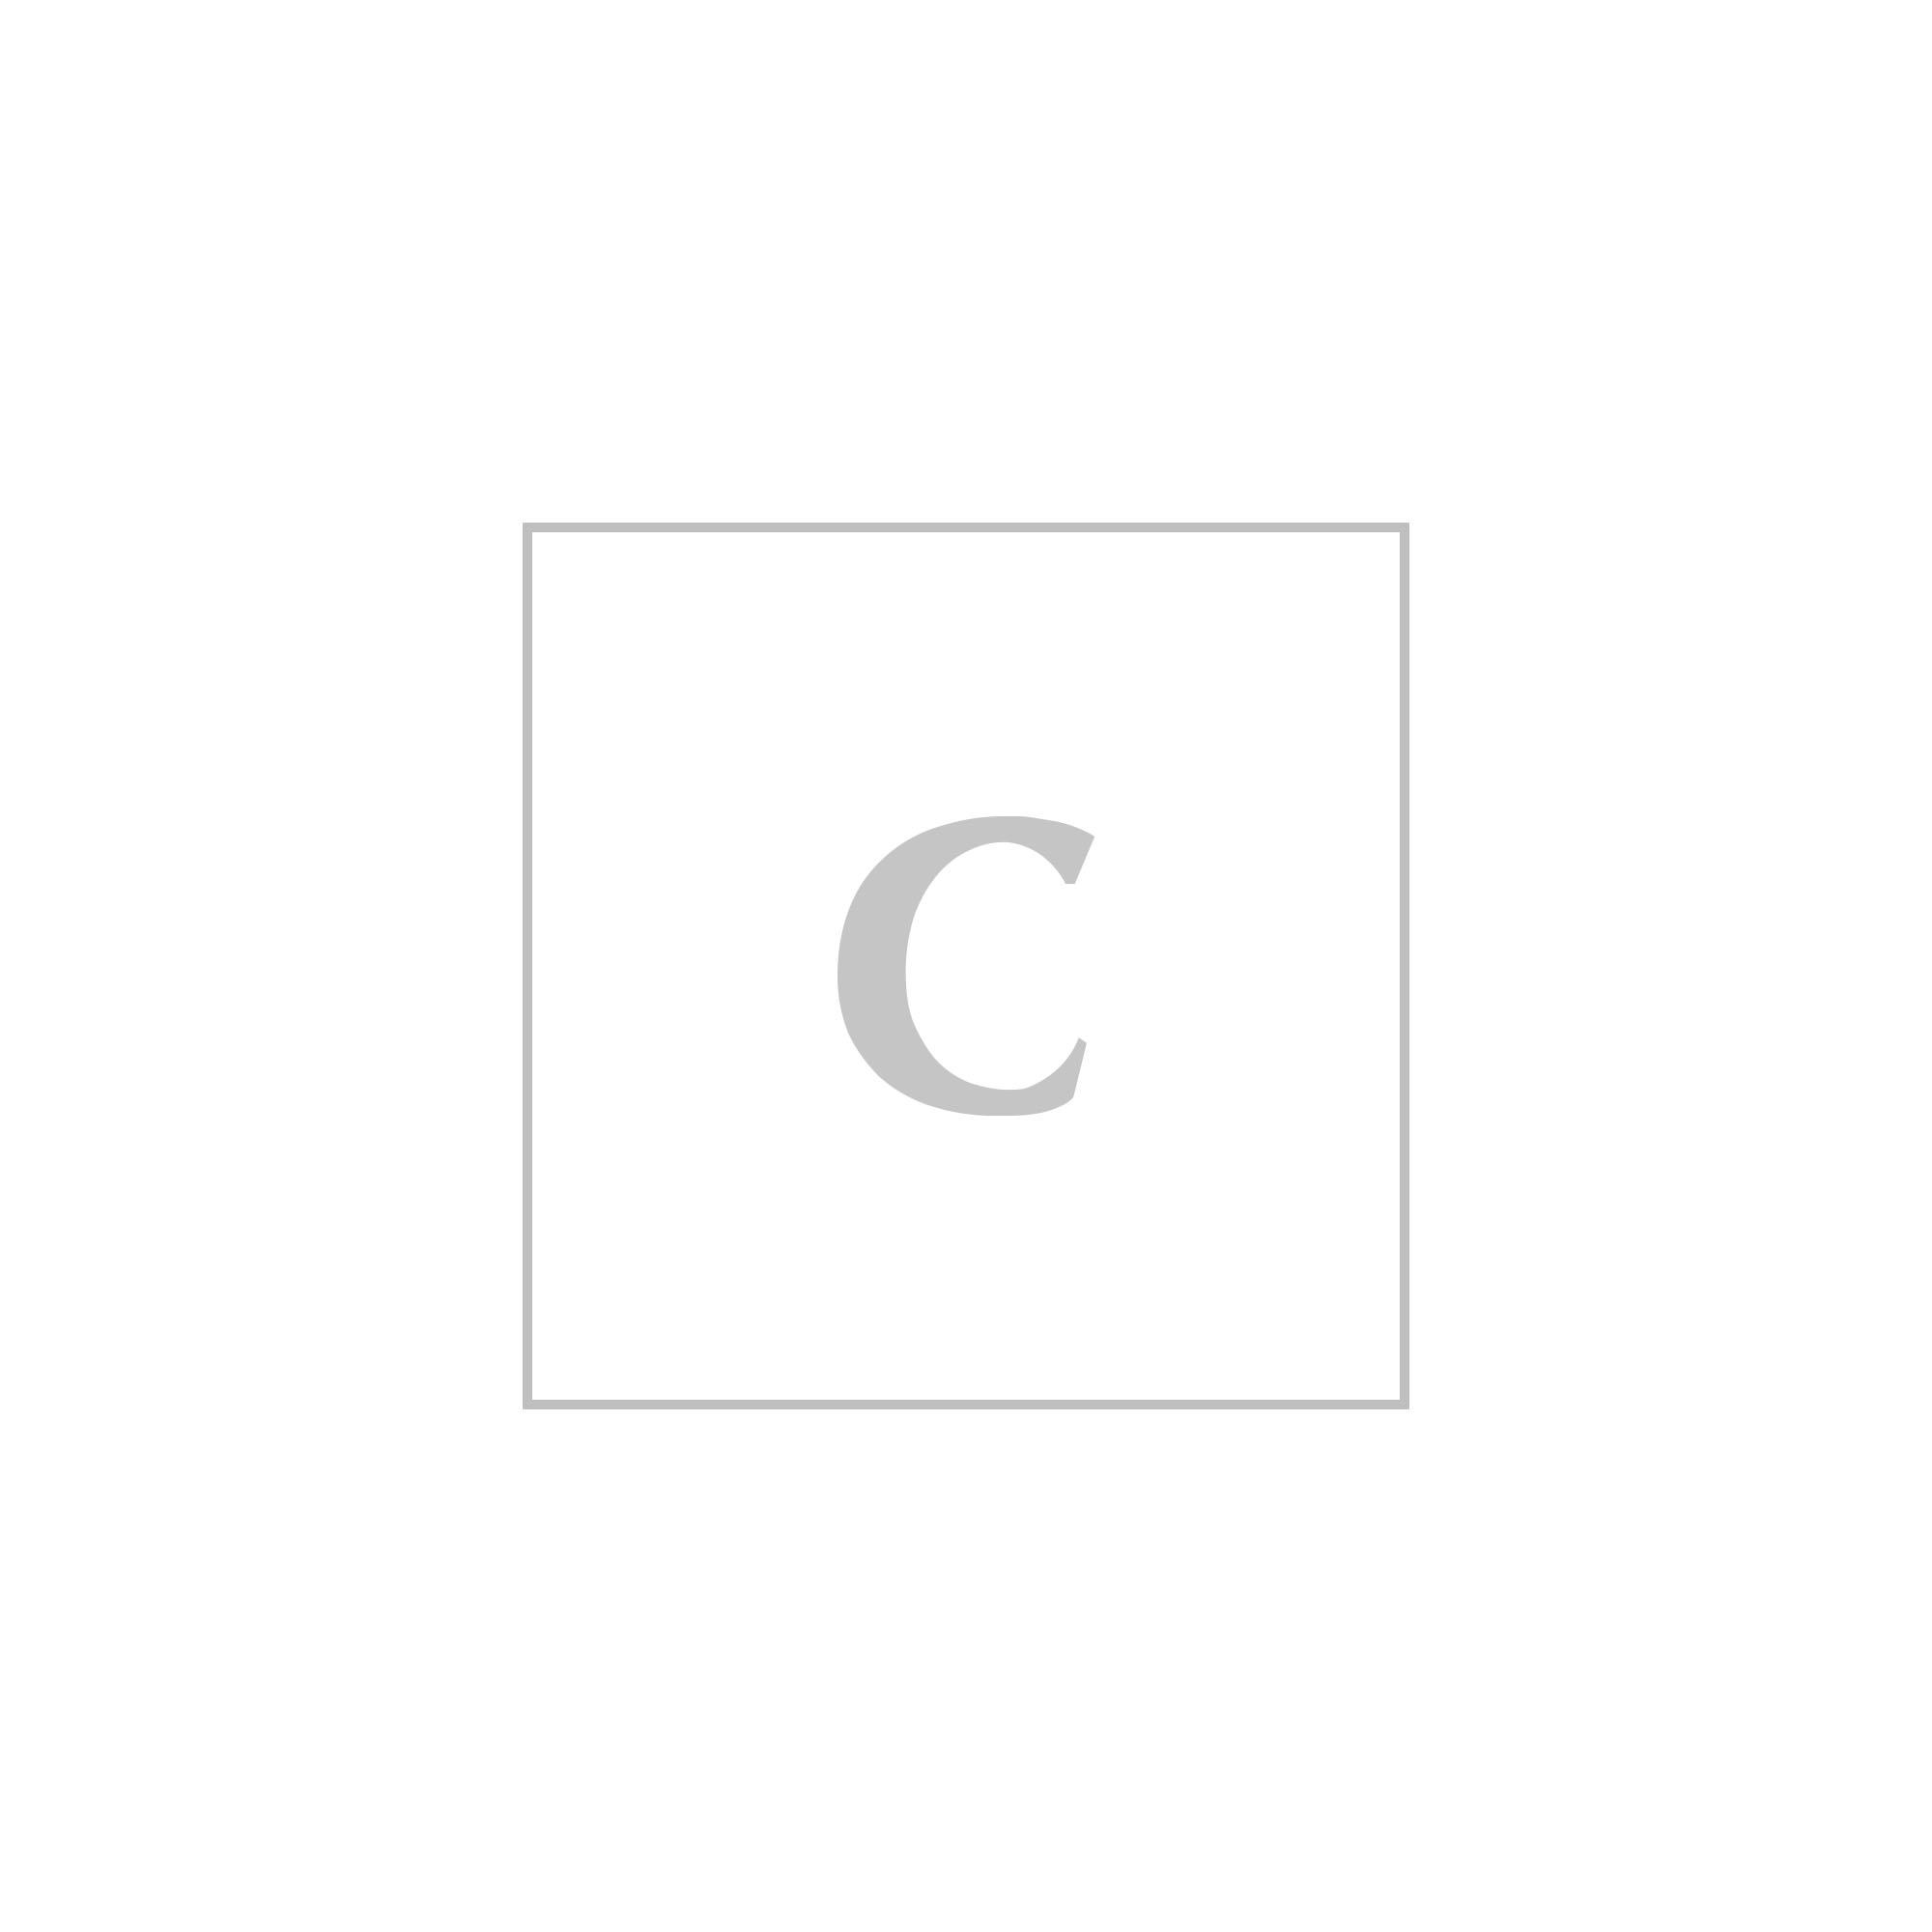 Dolce & gabbana printed patent bellucci slingbacks